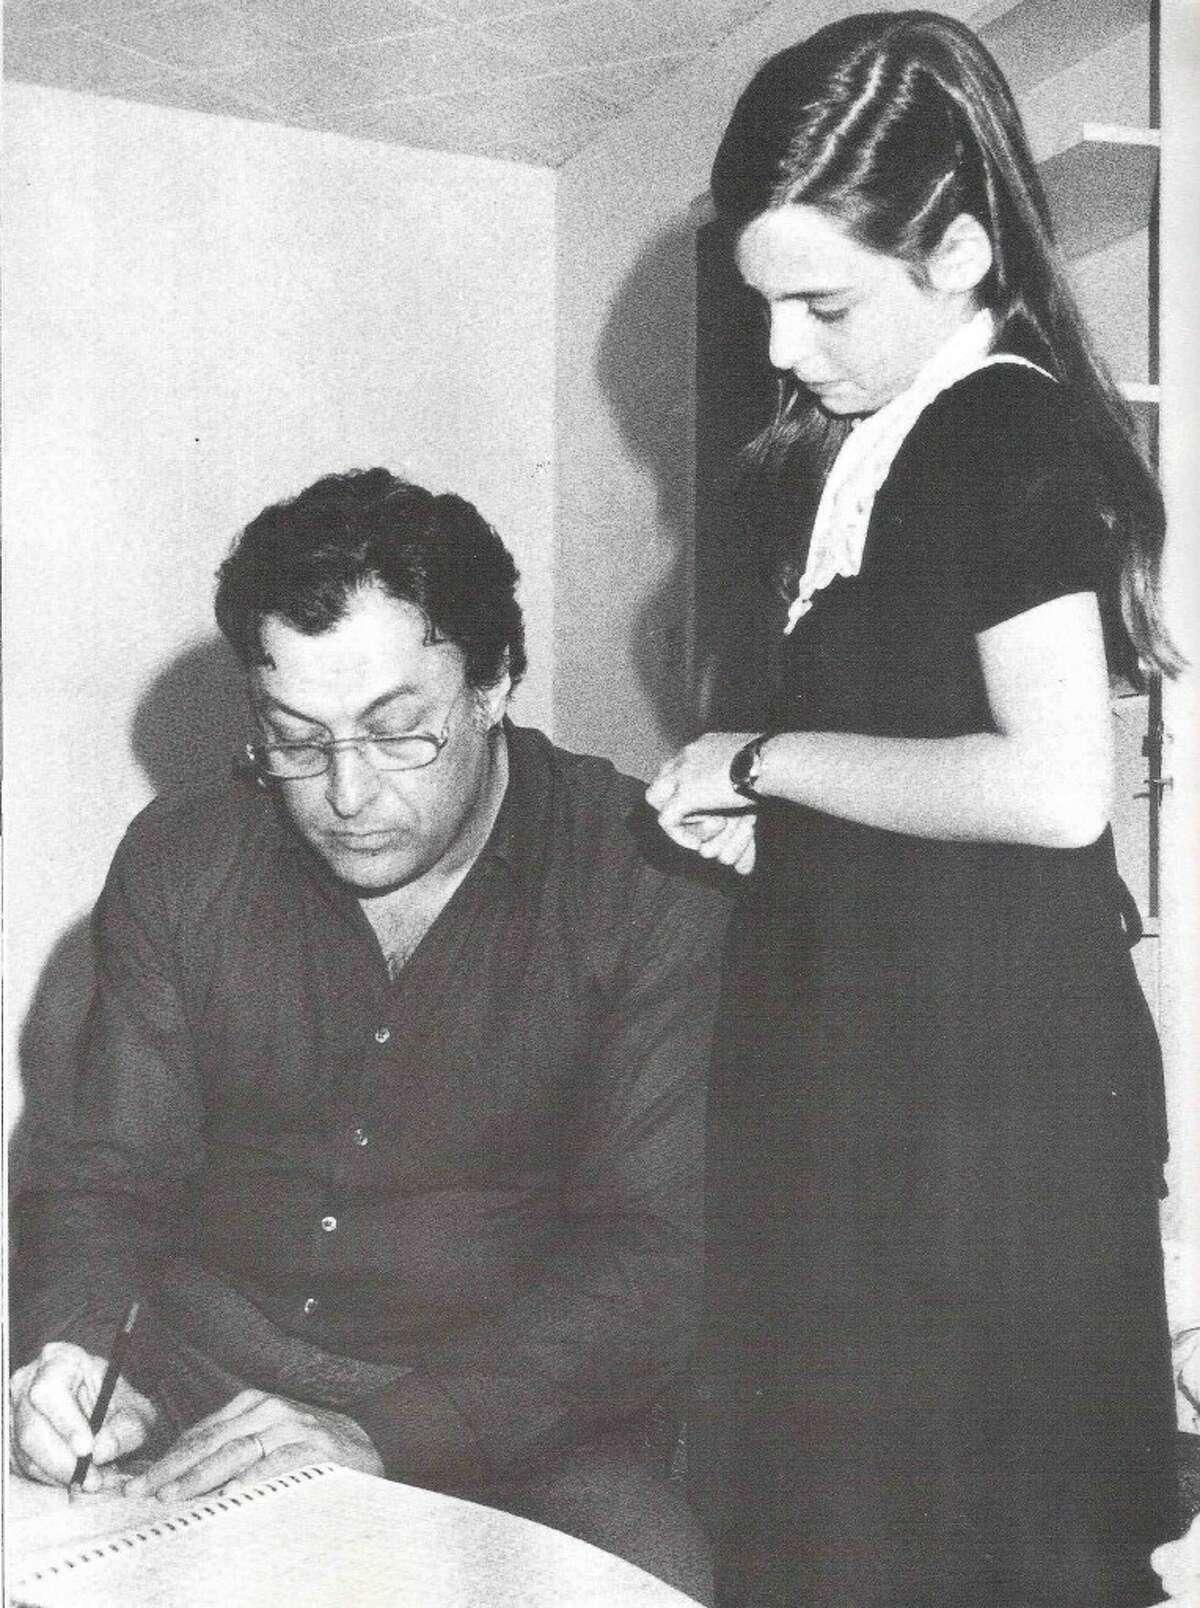 Dalit Warshaw with Zubin Mehta